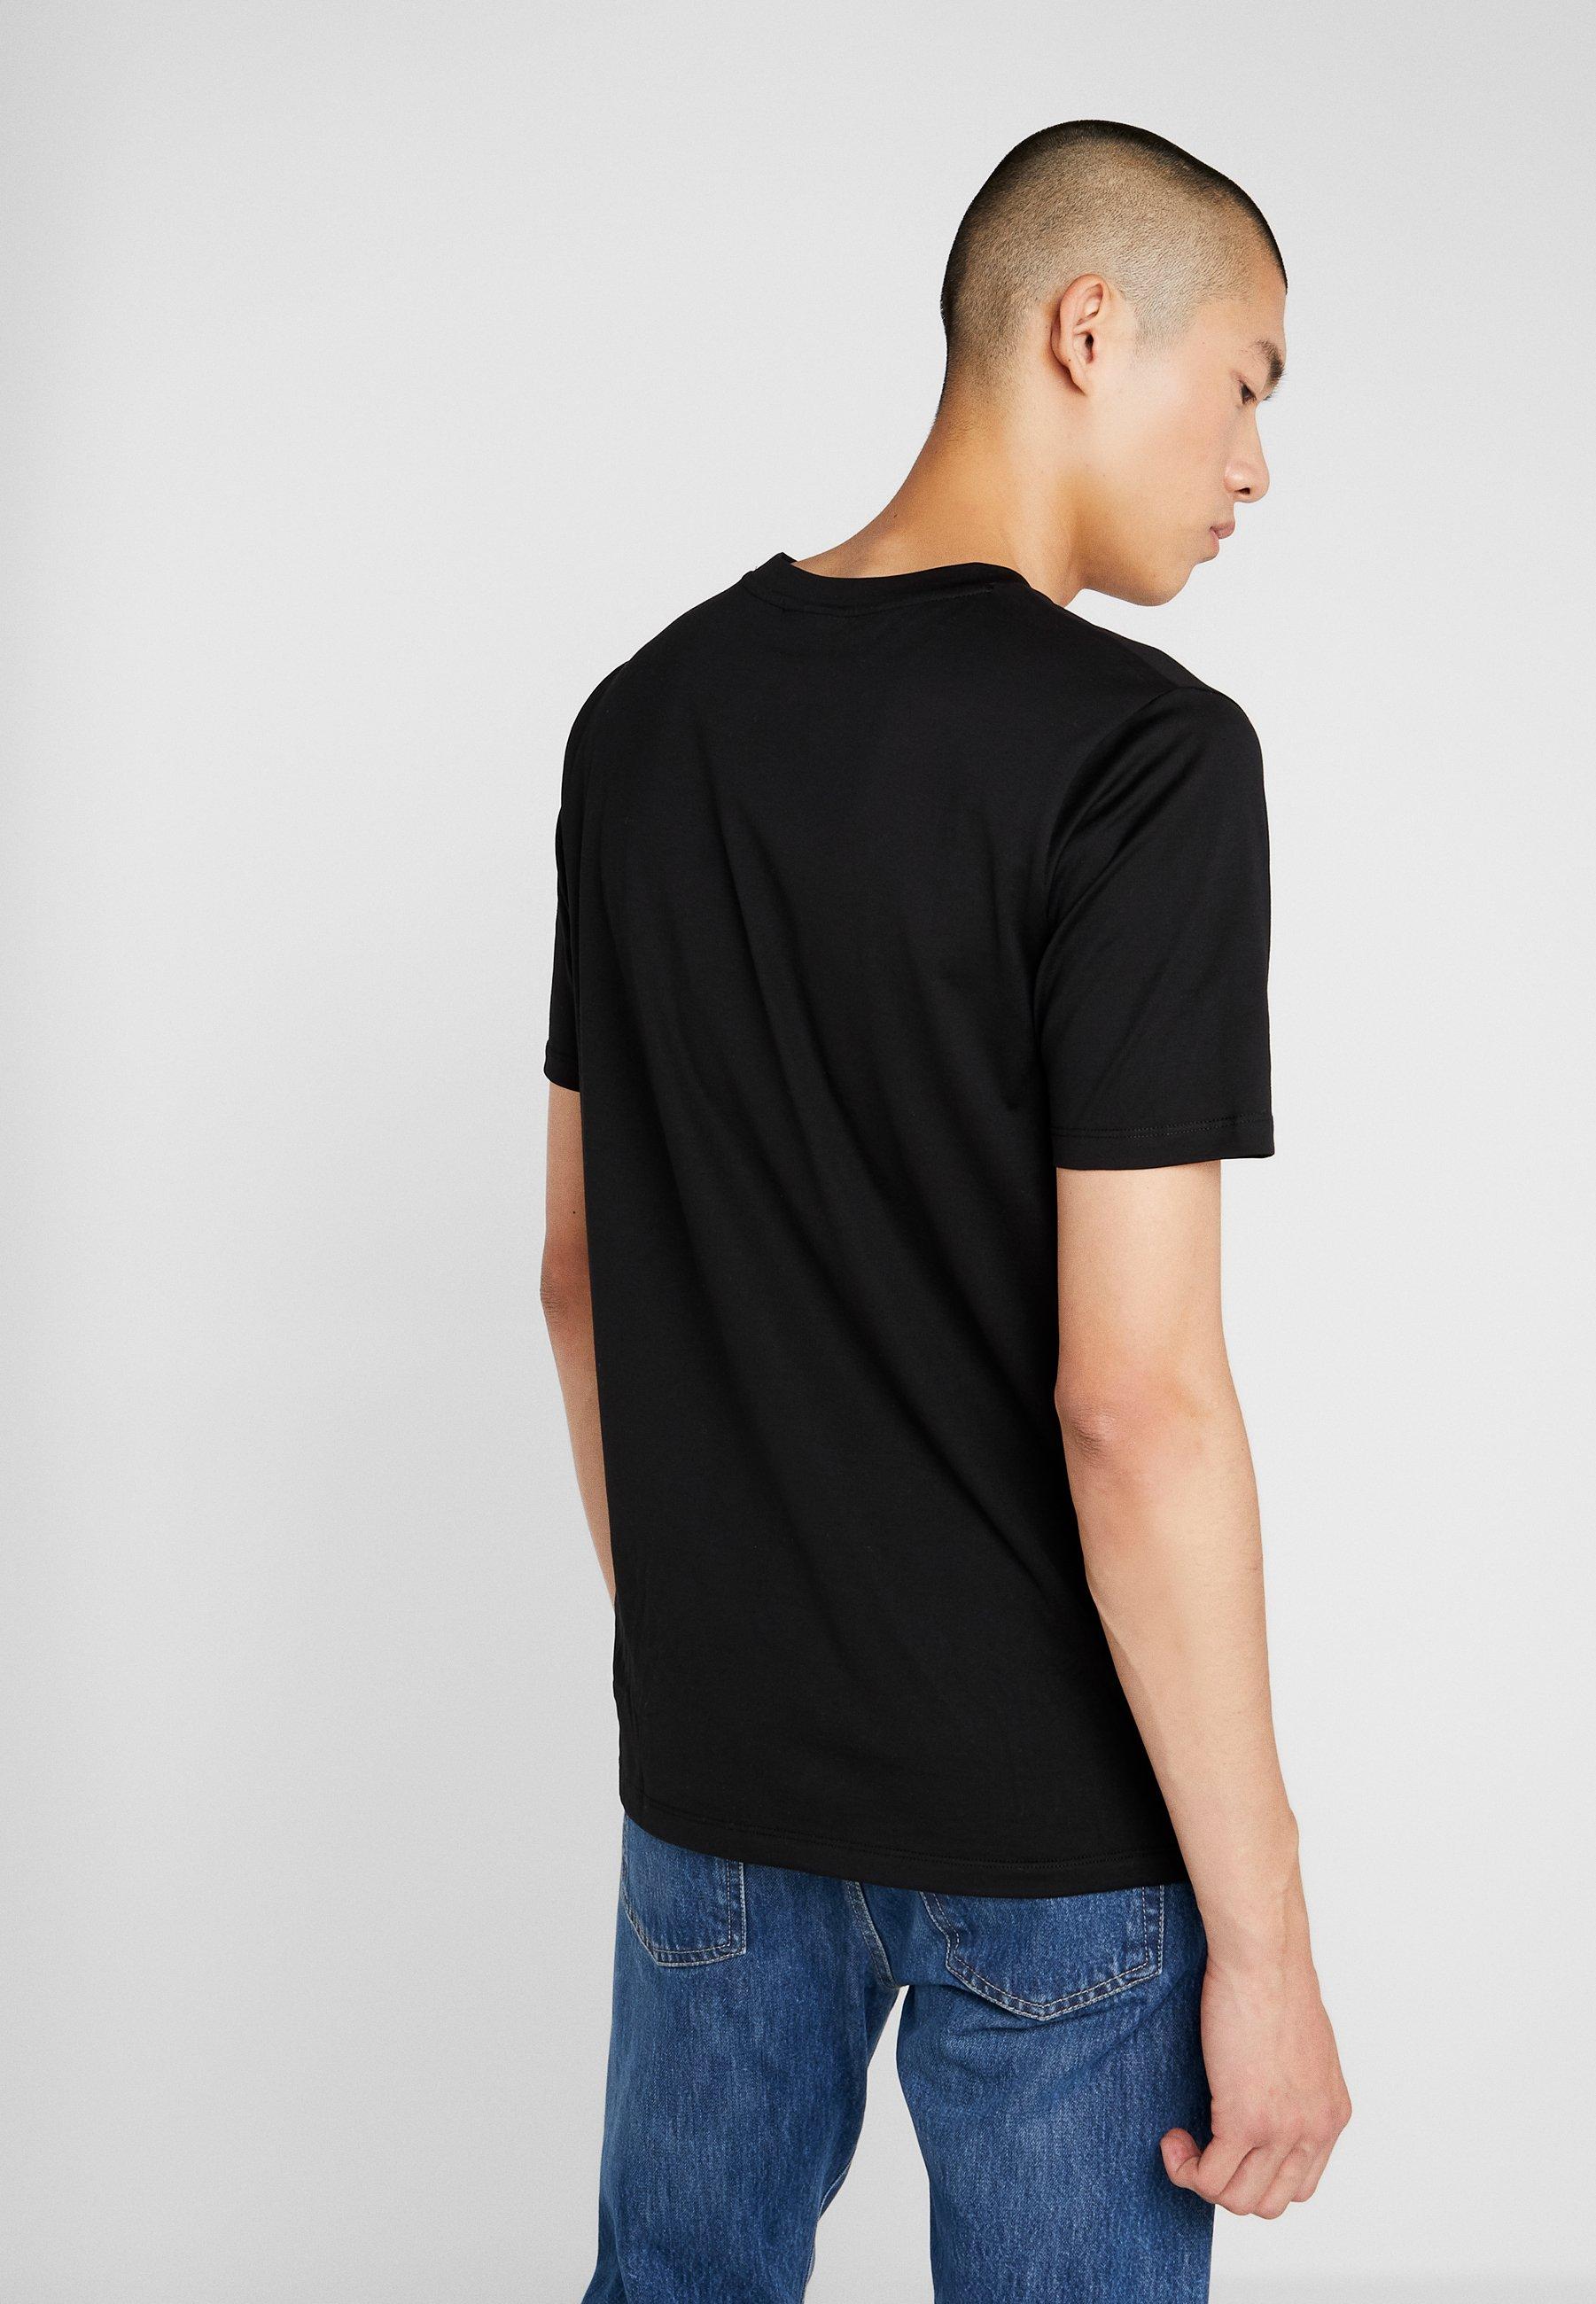 DurnedT shirt shirt Hugo Imprimé Hugo Hugo Black shirt DurnedT Black DurnedT Imprimé Imprimé uOkiPXZT